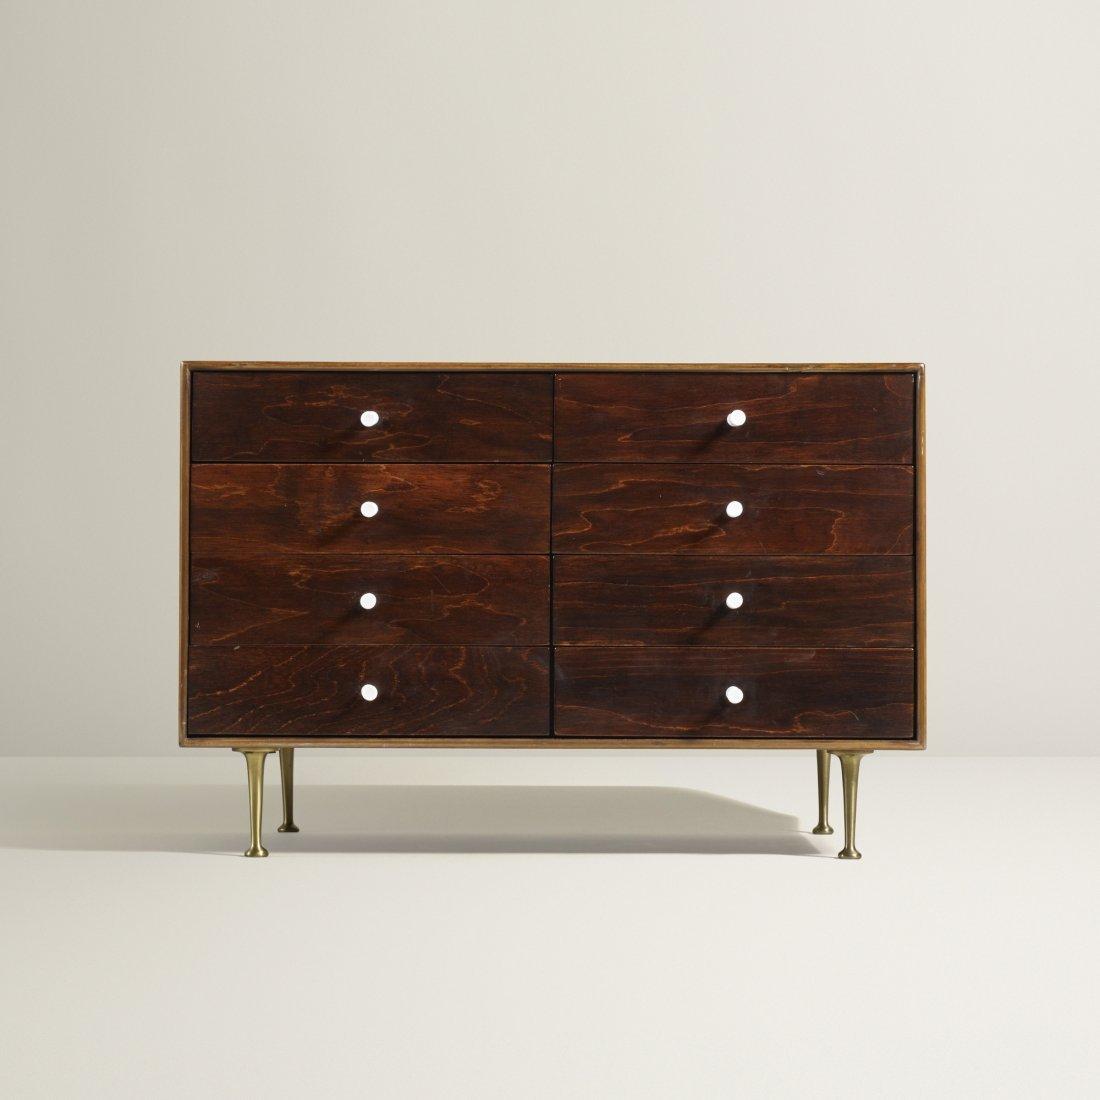 George Nelson & Associates cabinet, model 5212